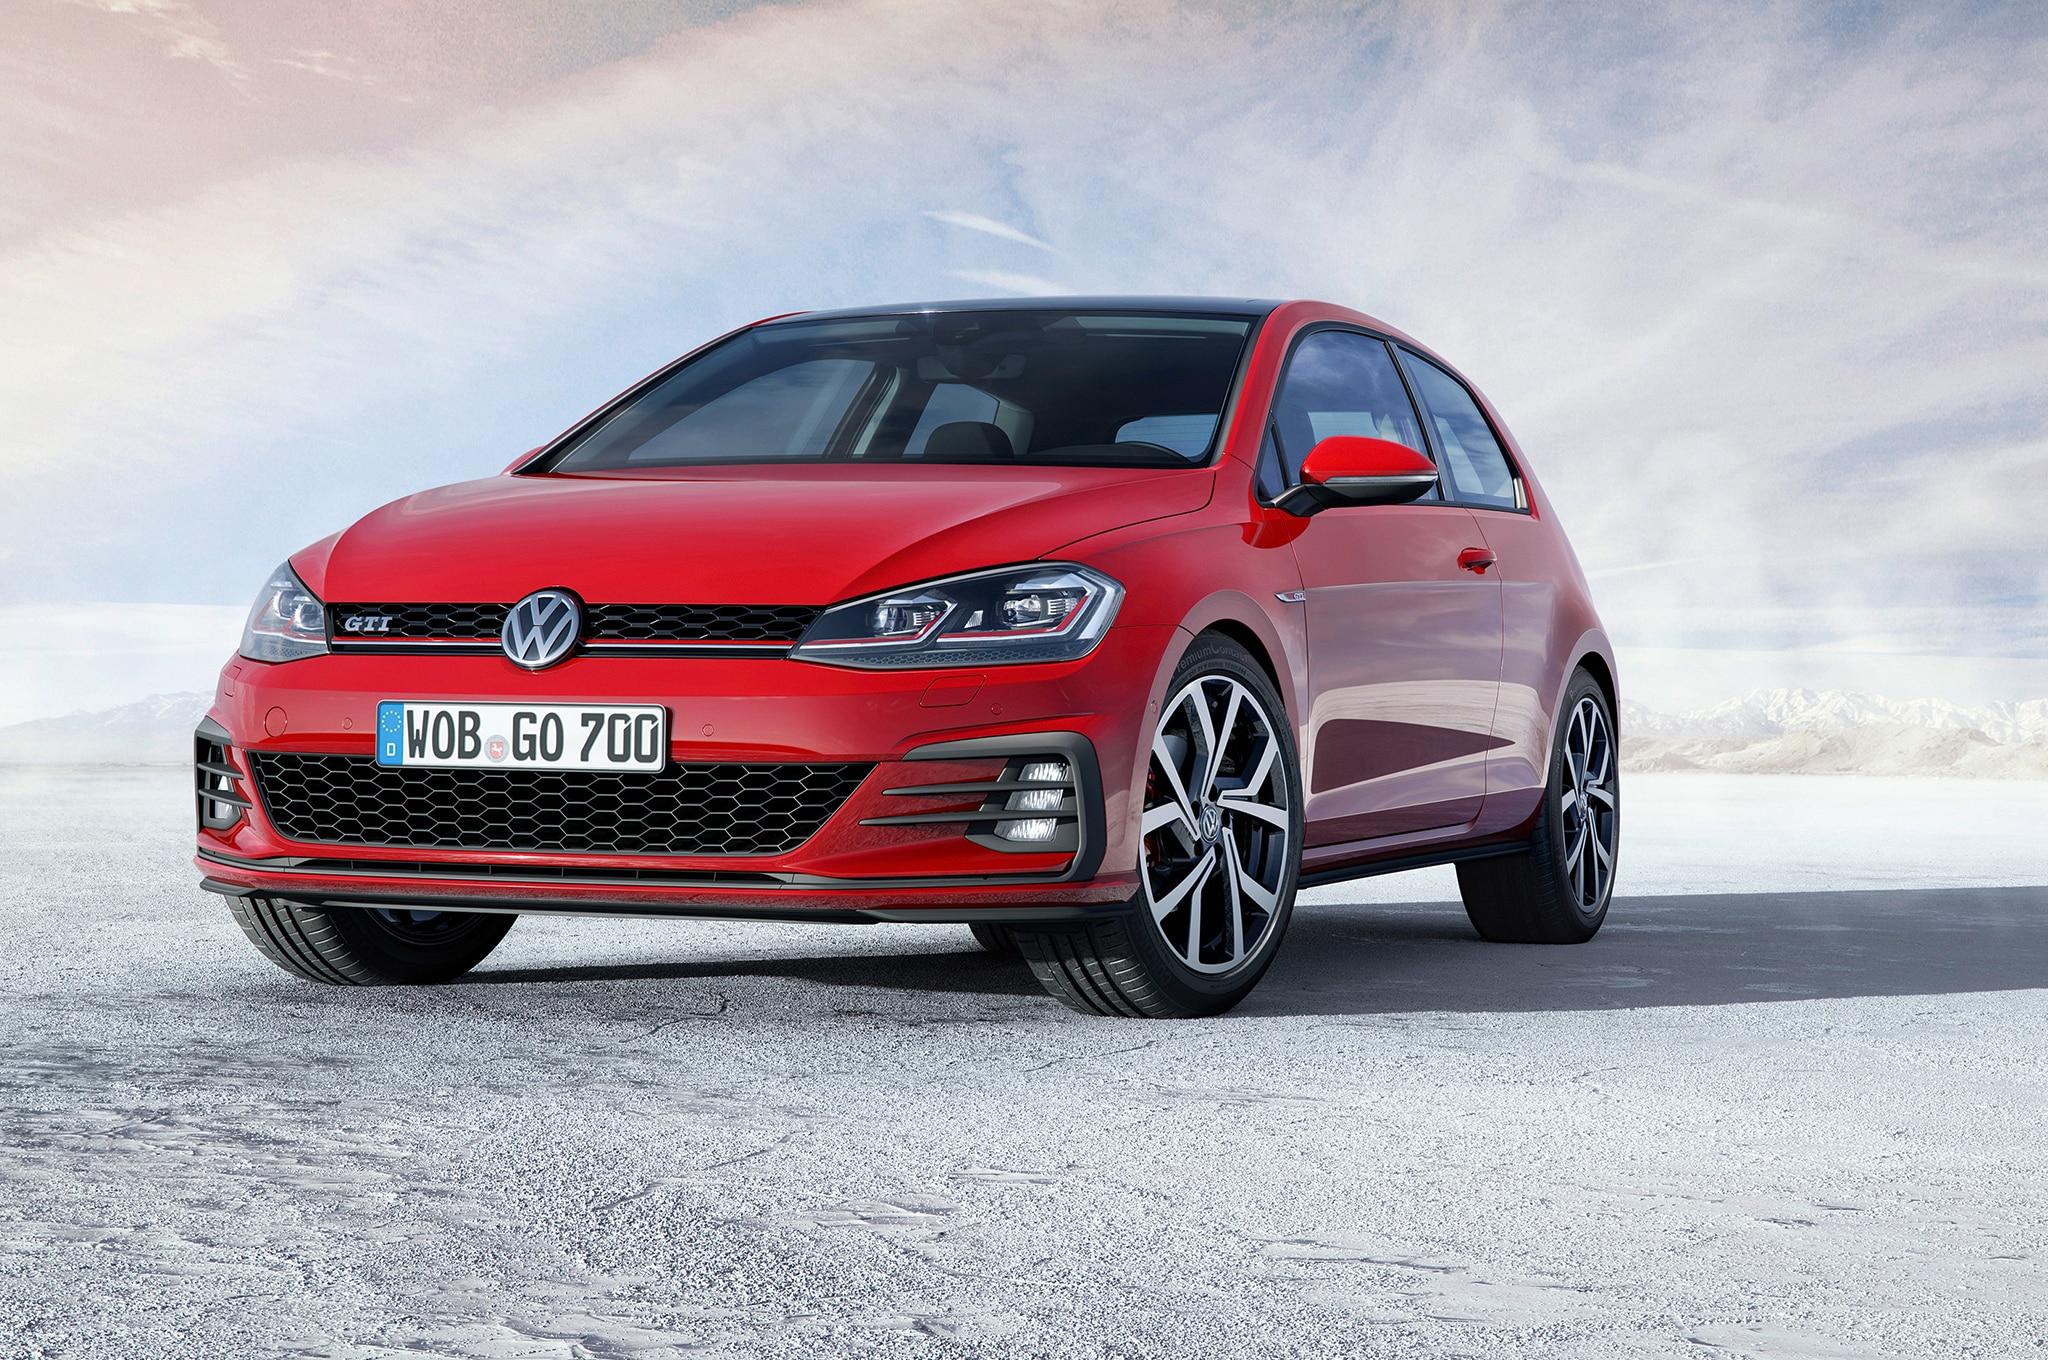 2018 Volkswagen Gti Review >> 2018 Volkswagen Golf GTI European Spec   Automobile Magazine